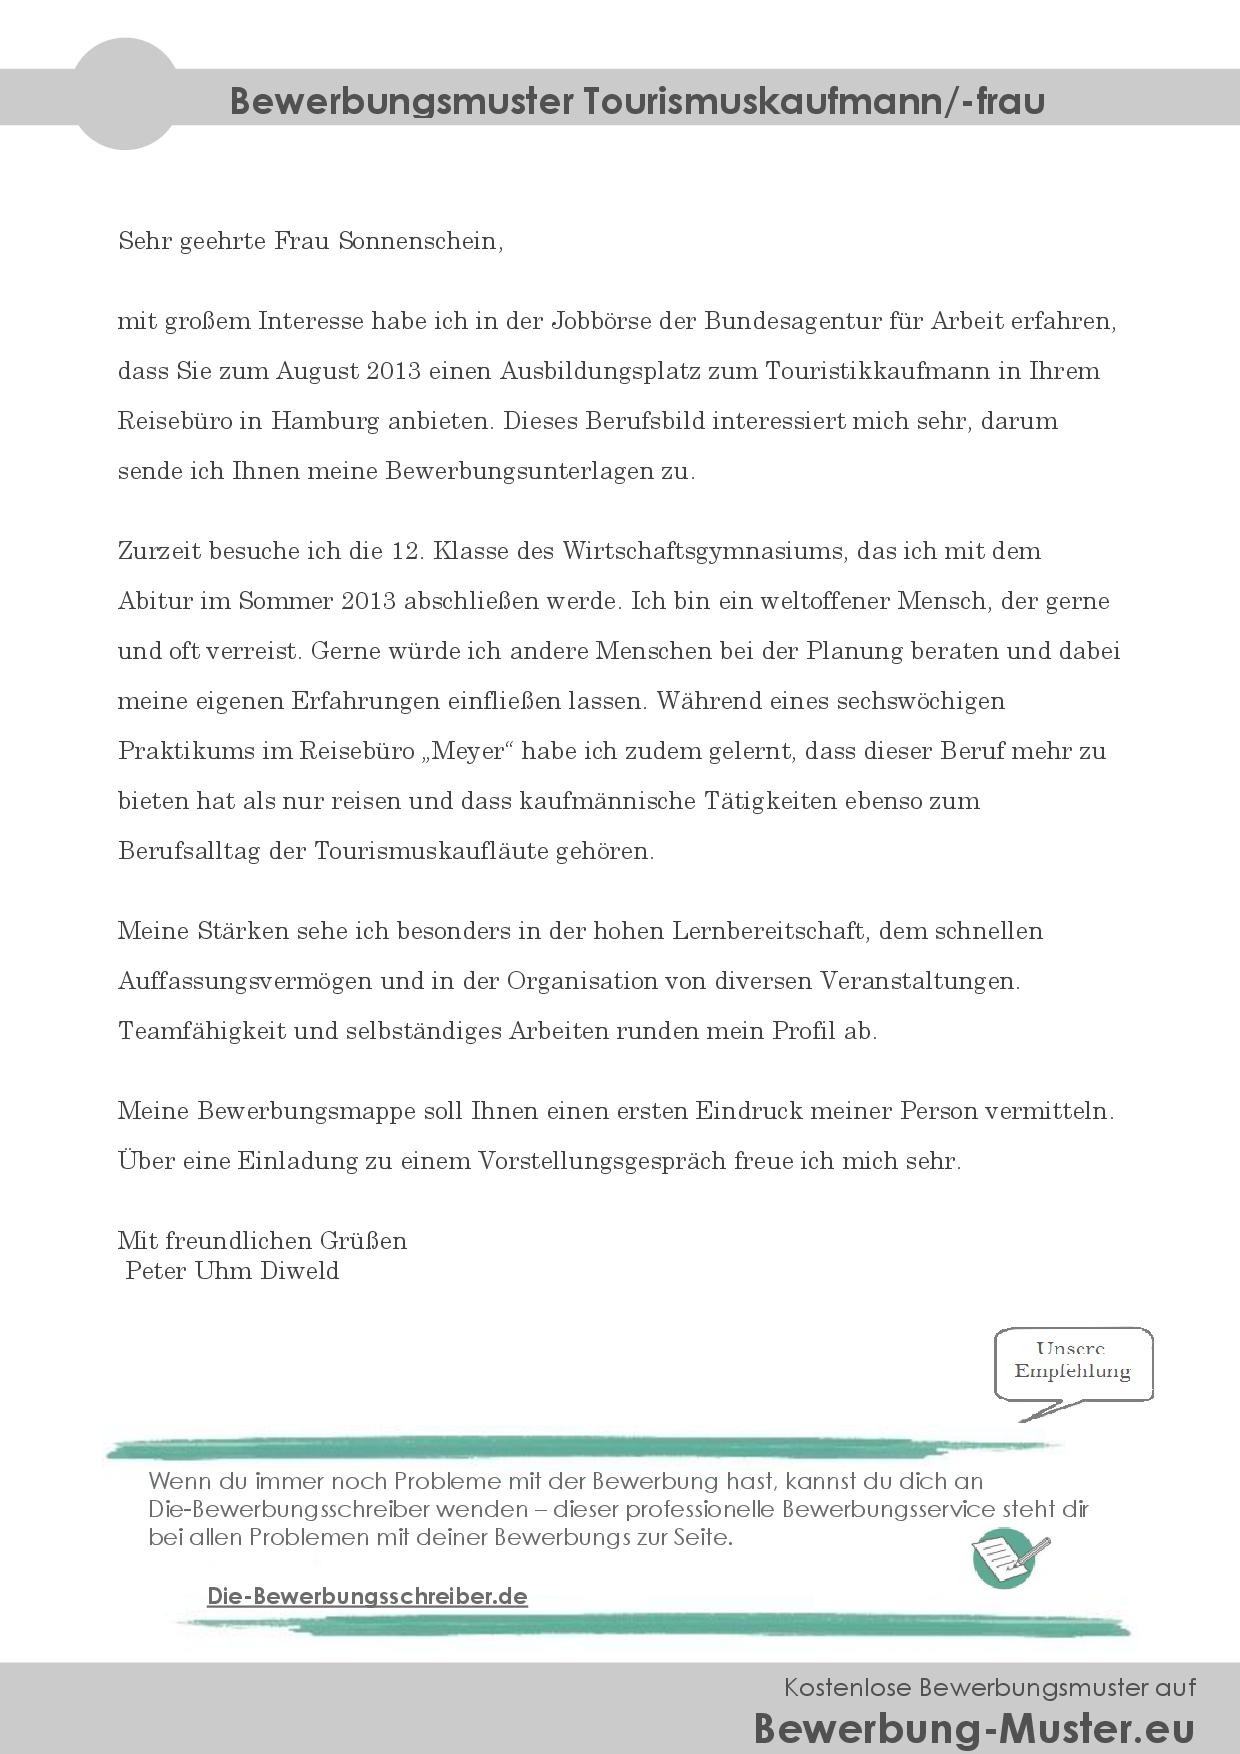 Bewerbungsmuster Tourismuskaufmann/-frau